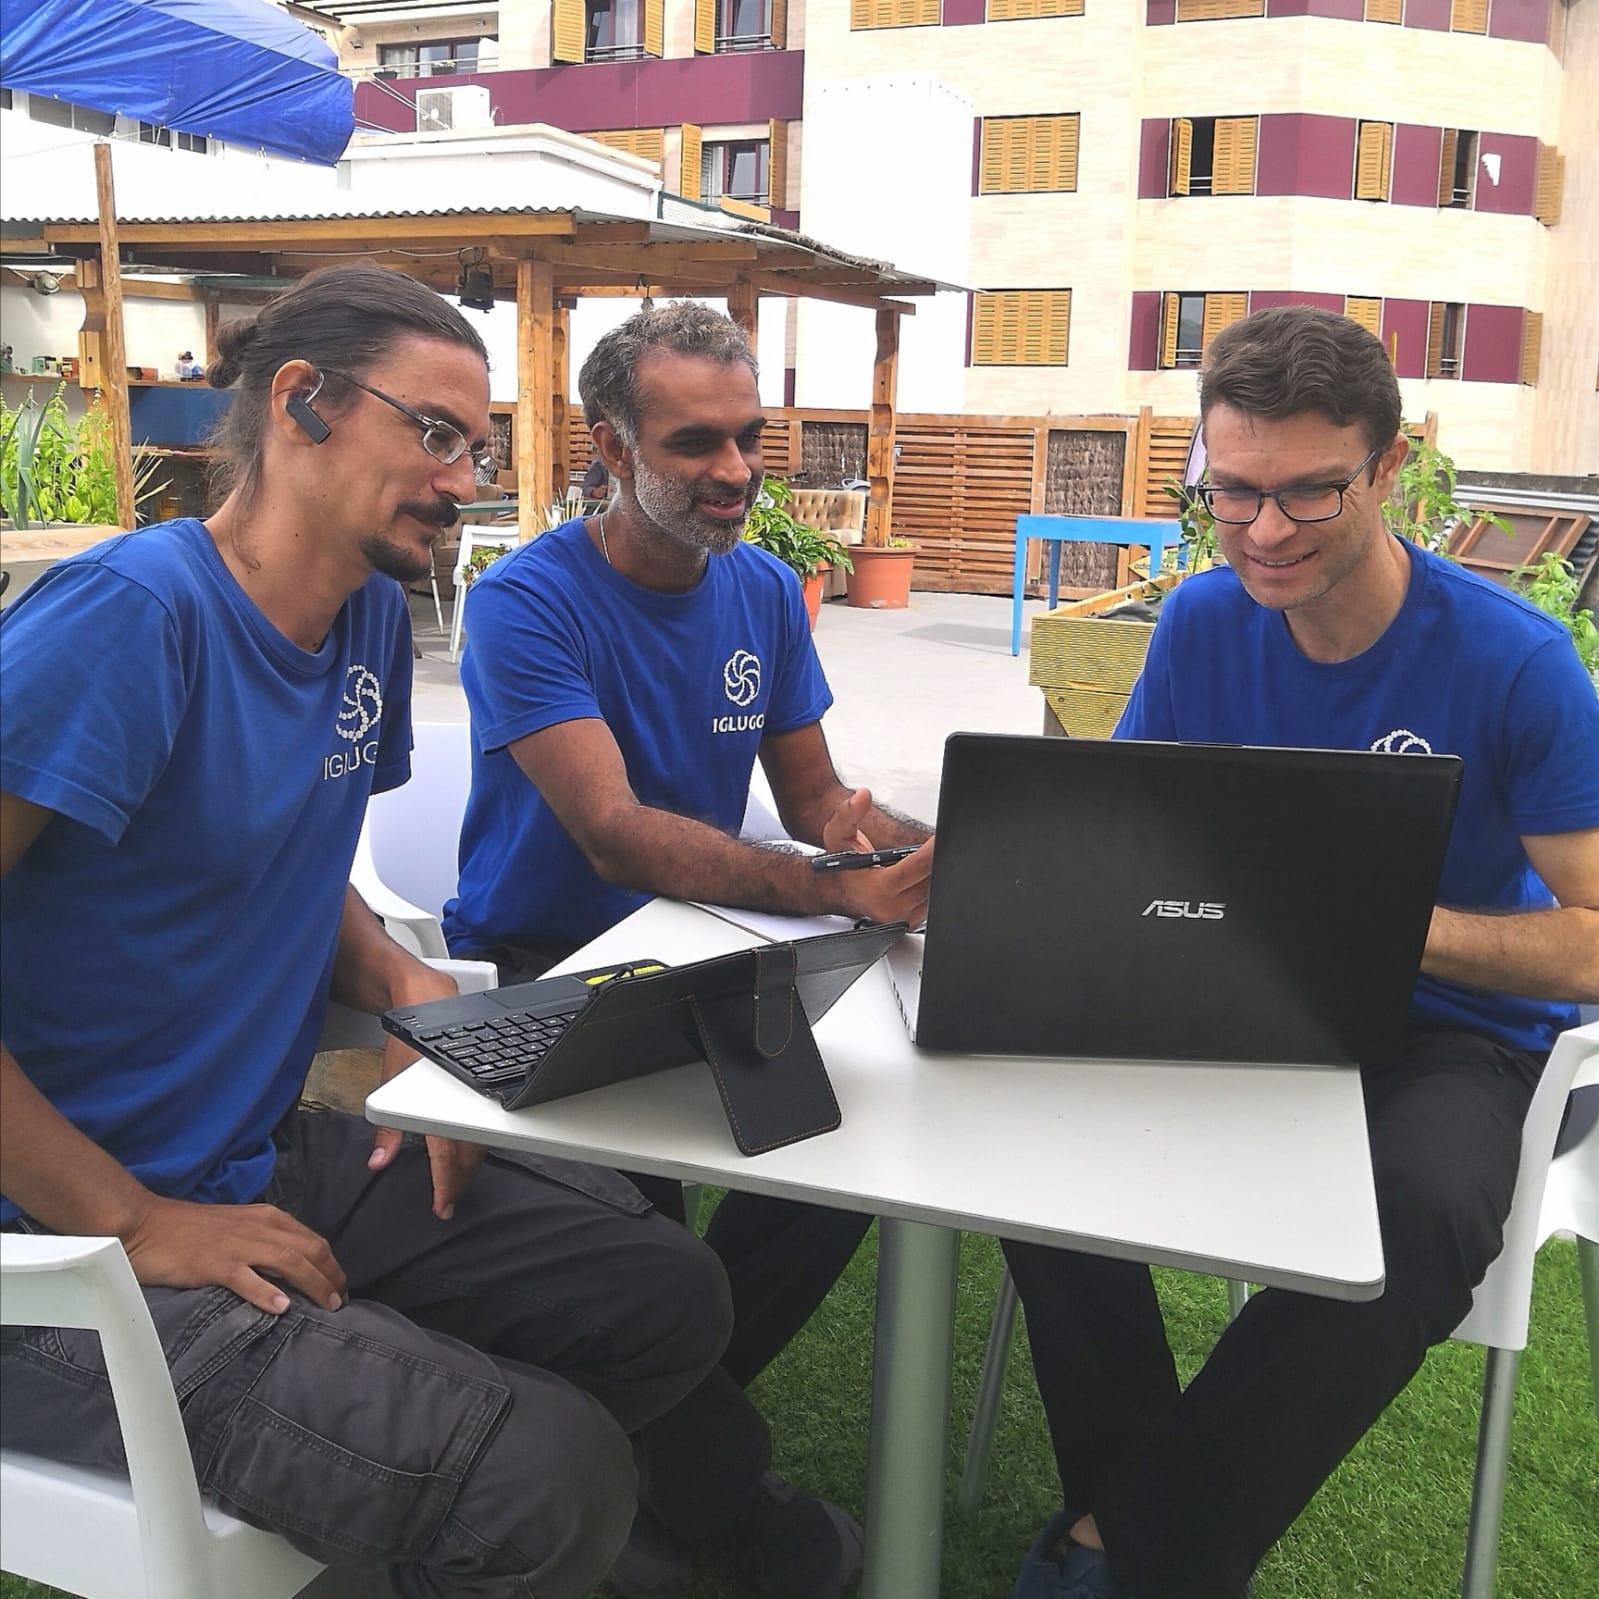 iglugo_team_in the terrace